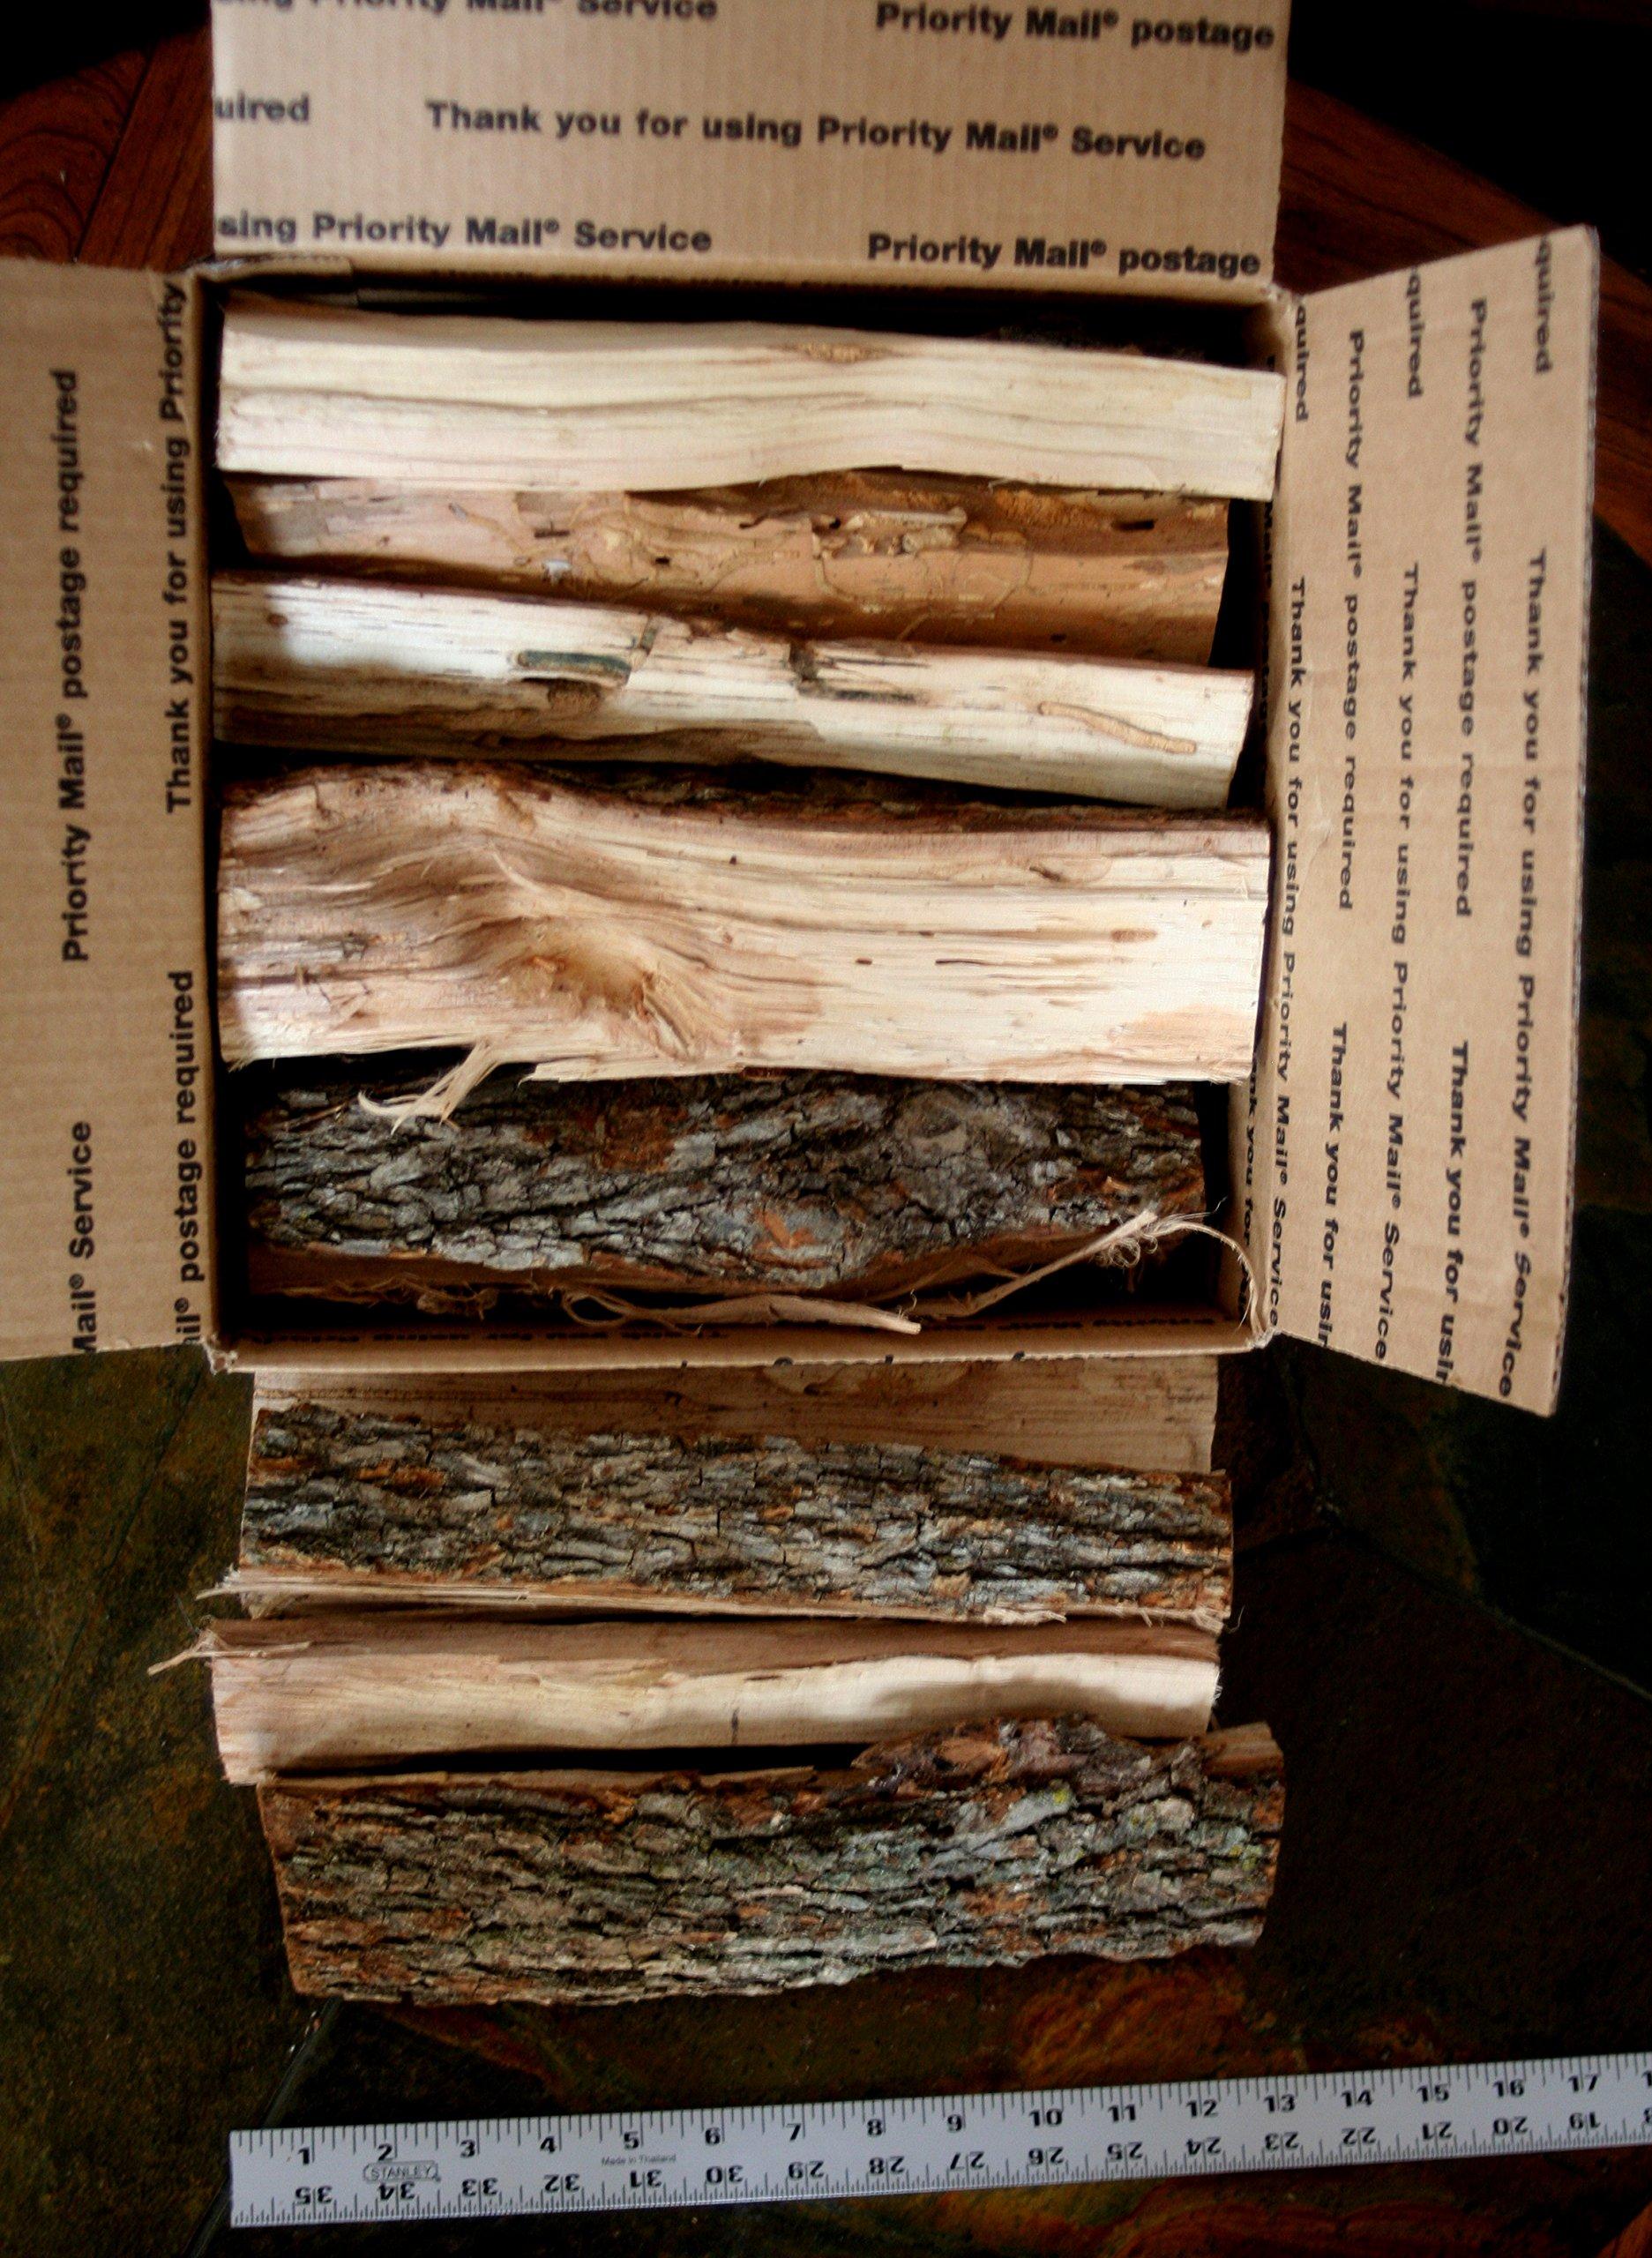 J.C.'s Smoking Wood Sticks - 730 Cu Inch Box - Pecan by J.C.'s Smoking Wood Products